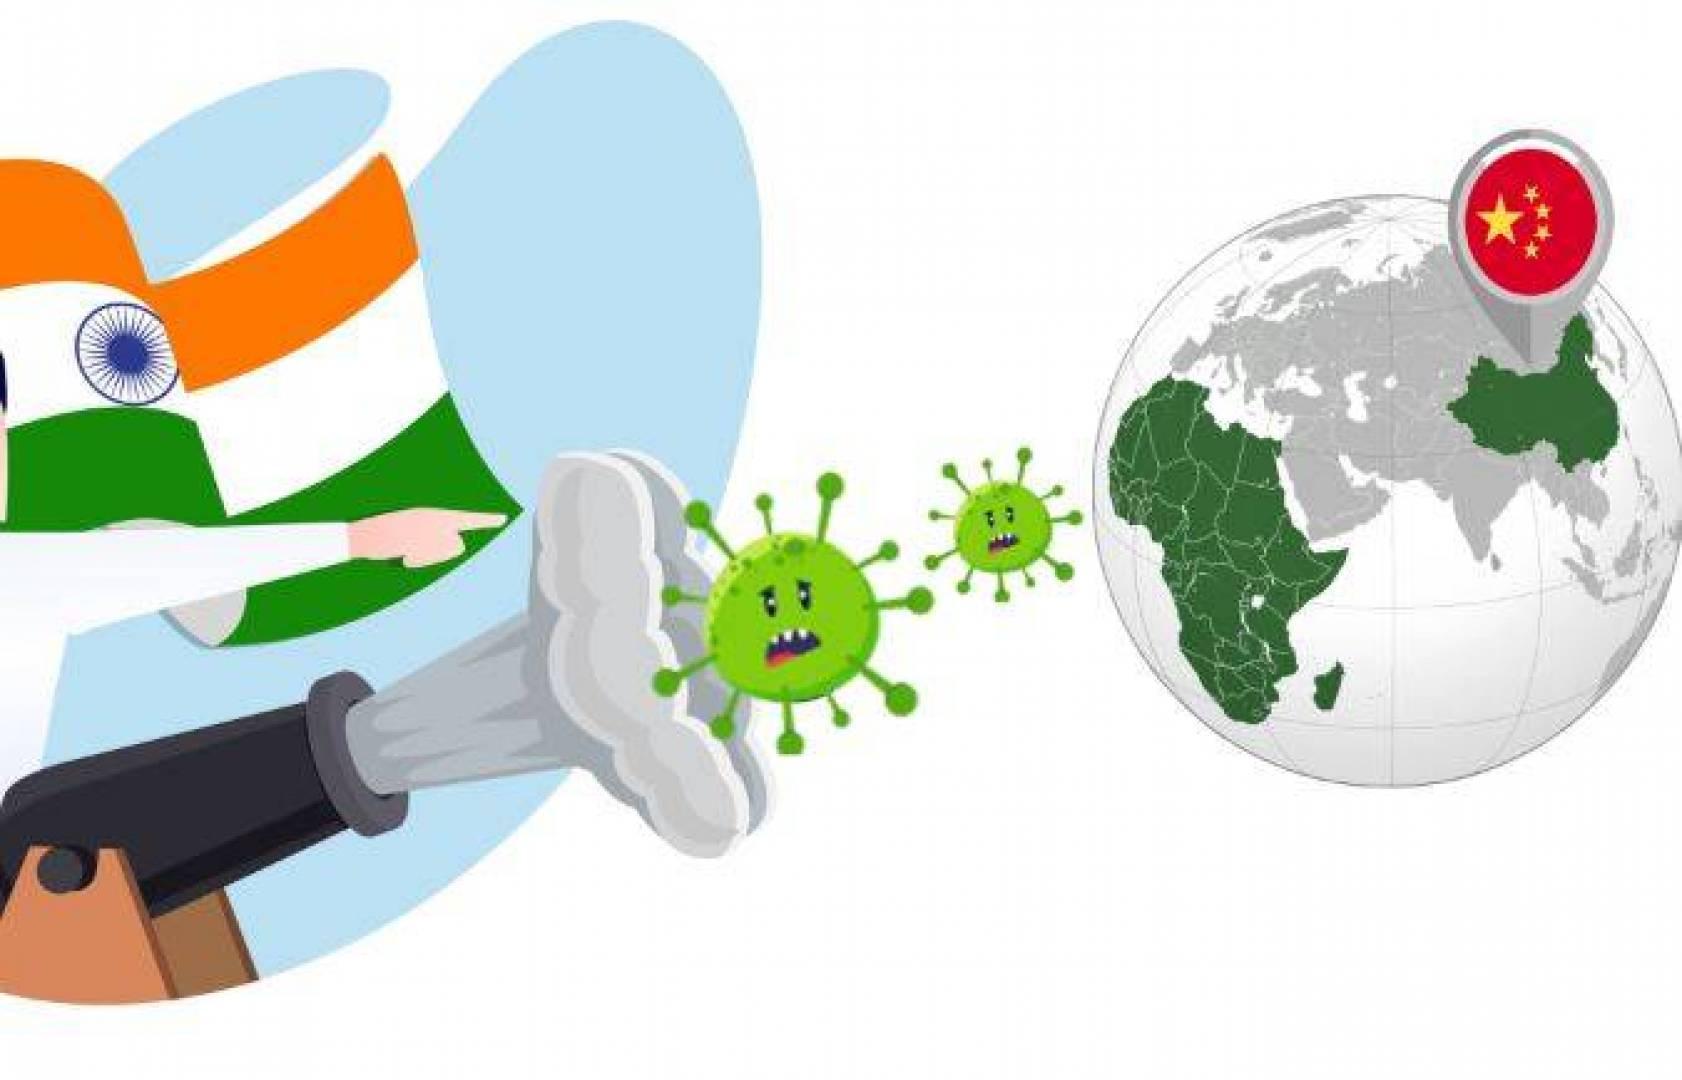 الصين تبرئ نفسها: «كورونا» فيروس هندي